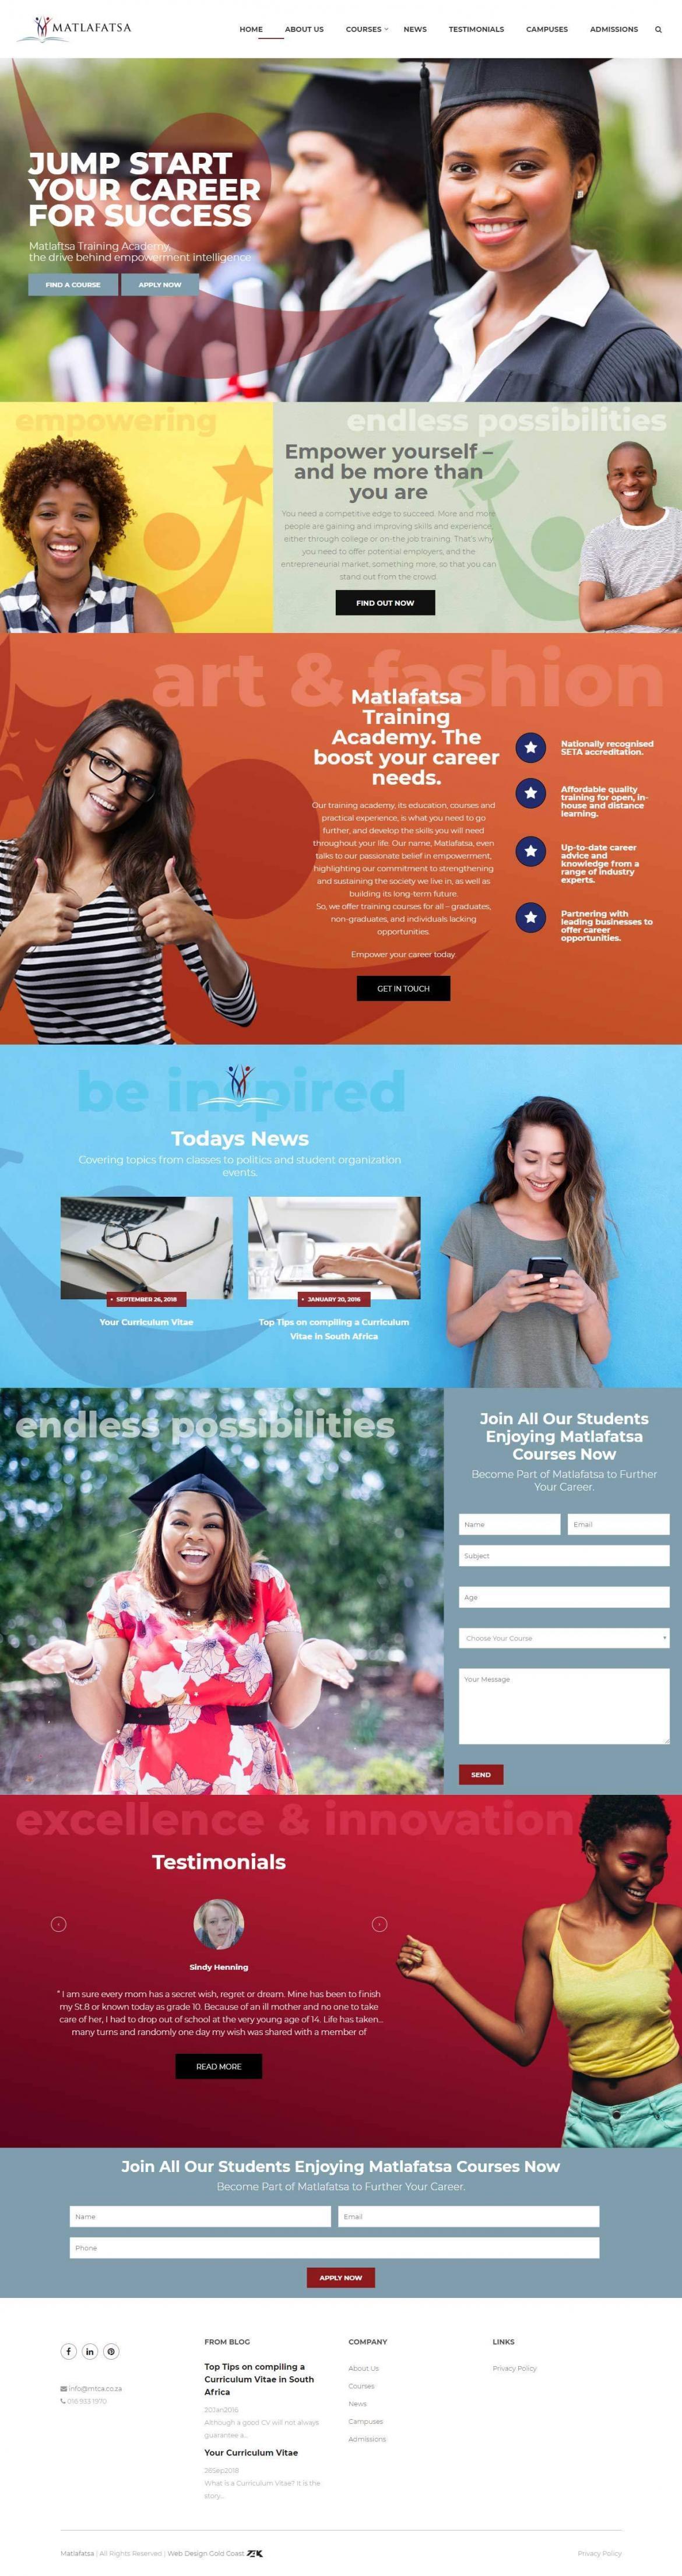 Matlafatsa website - Talk Digital